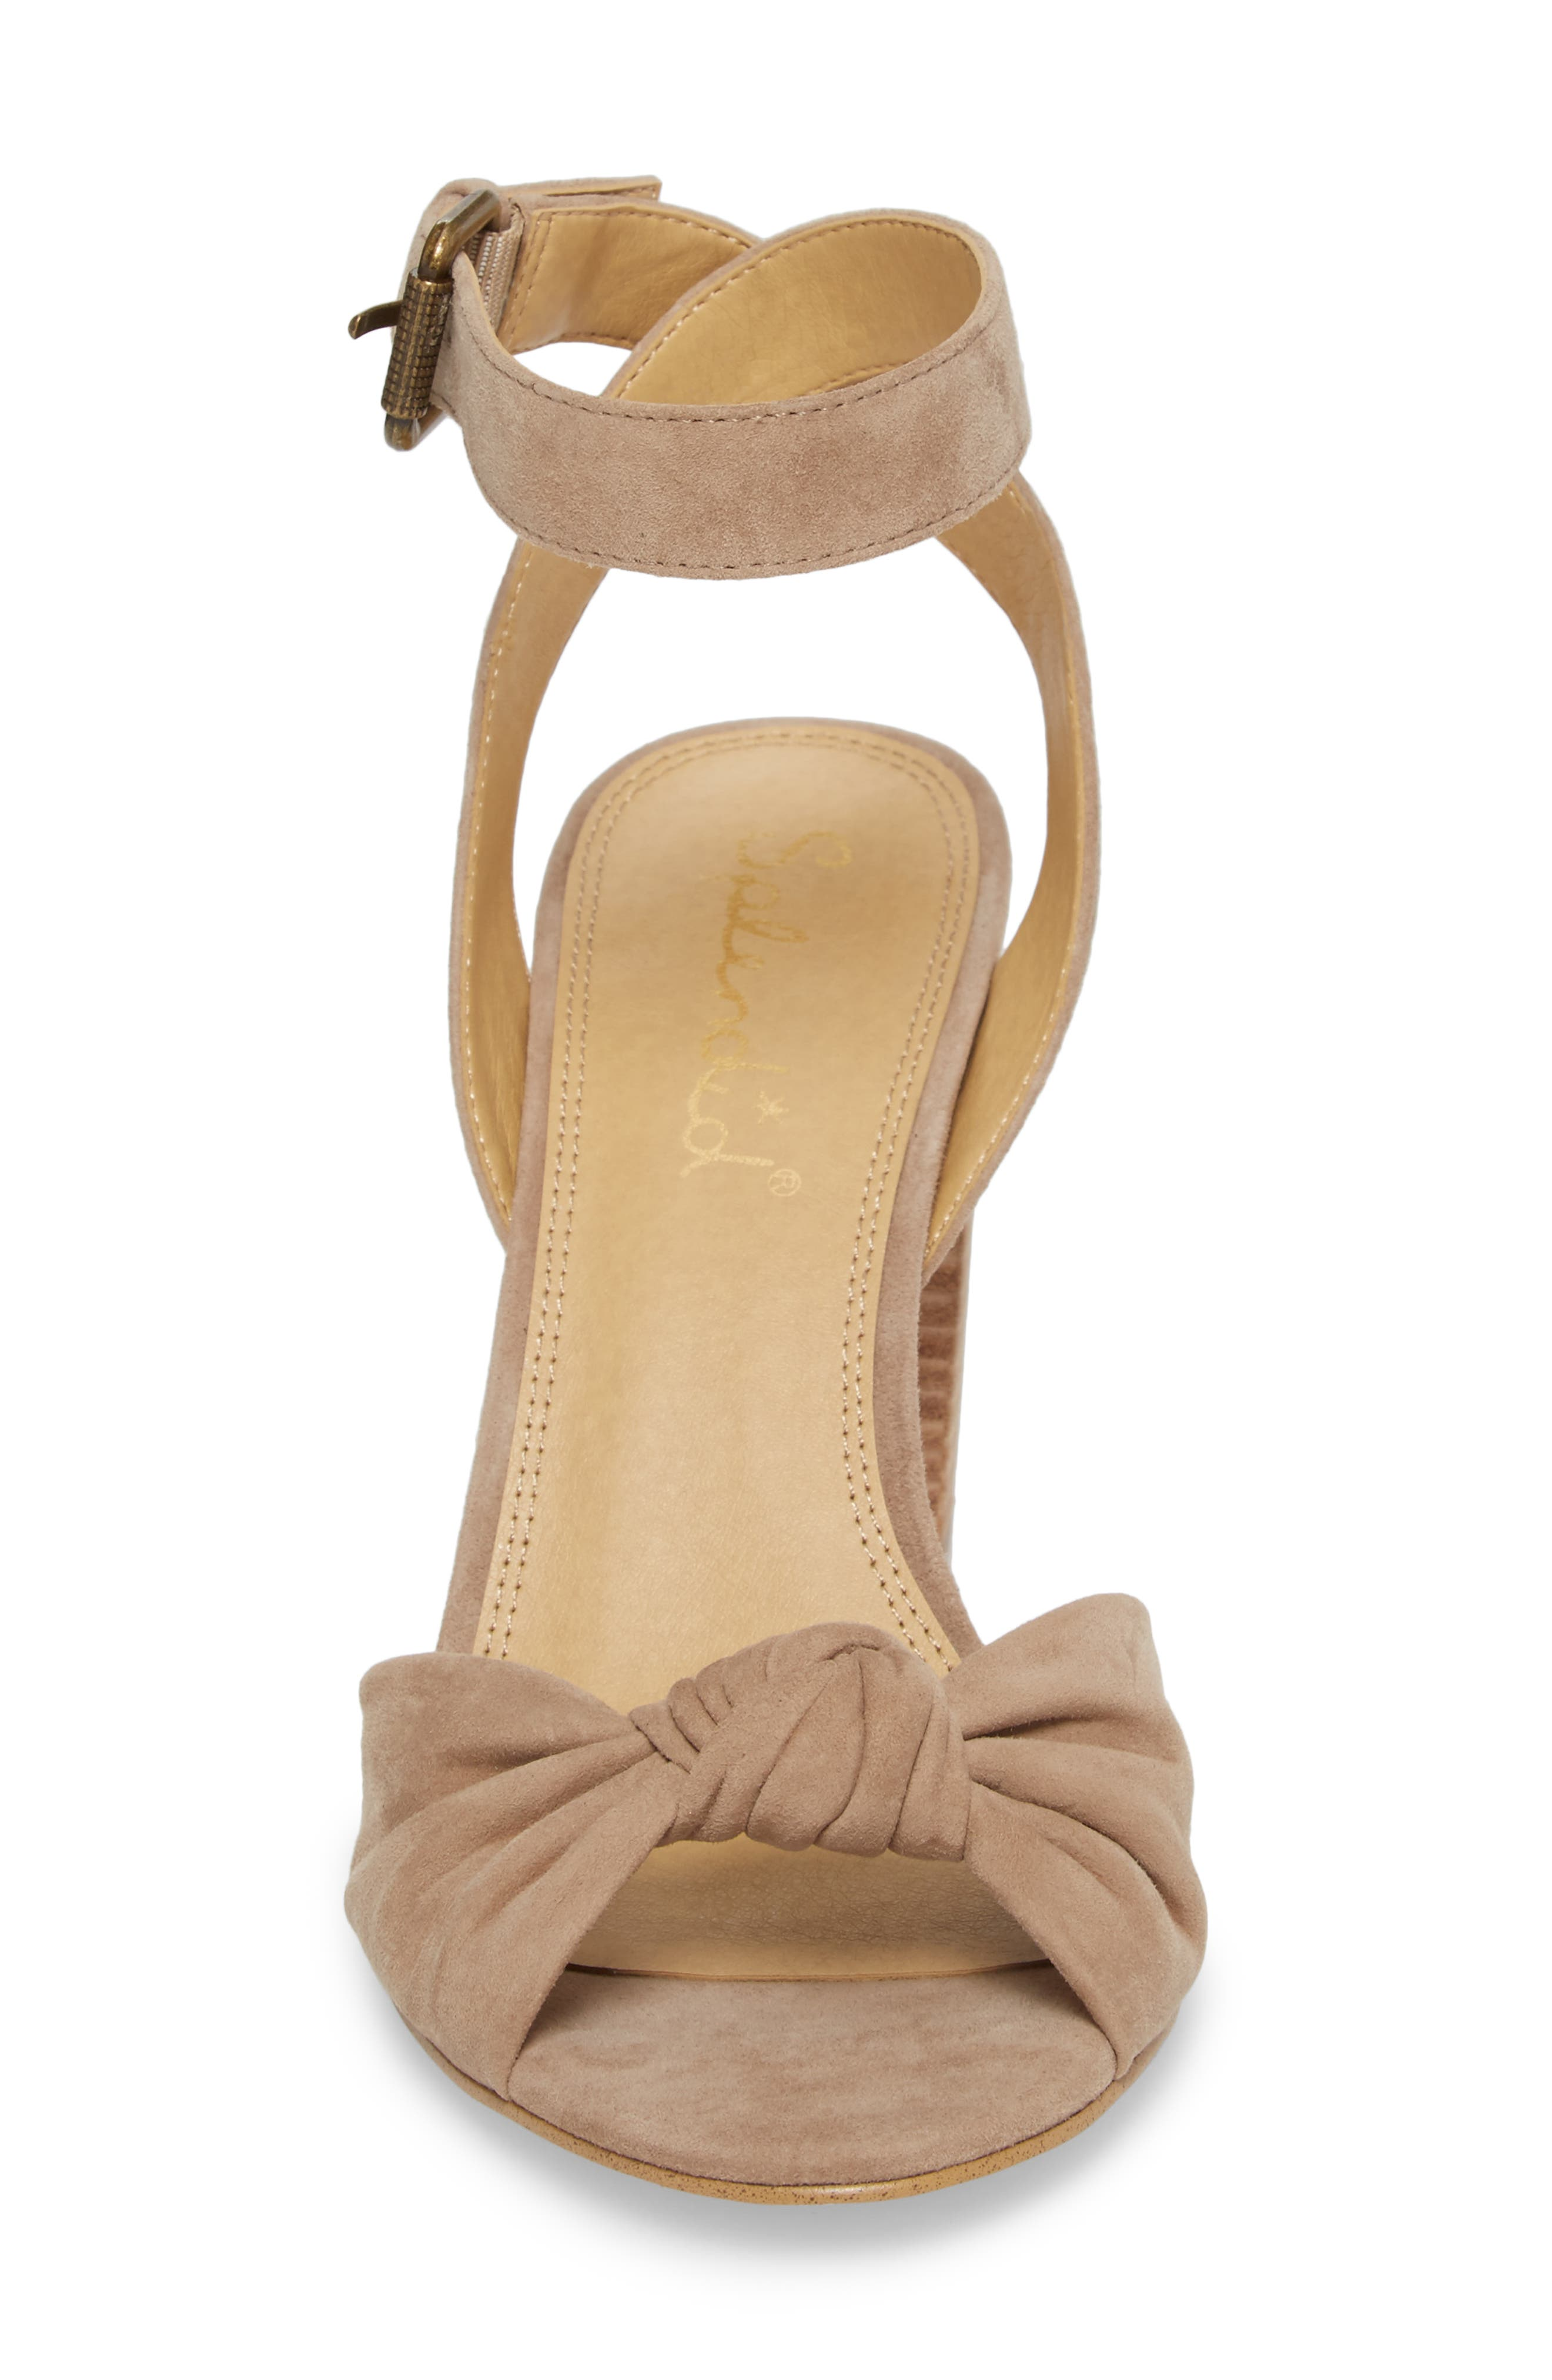 Bea Knotted Sandal,                             Alternate thumbnail 4, color,                             252